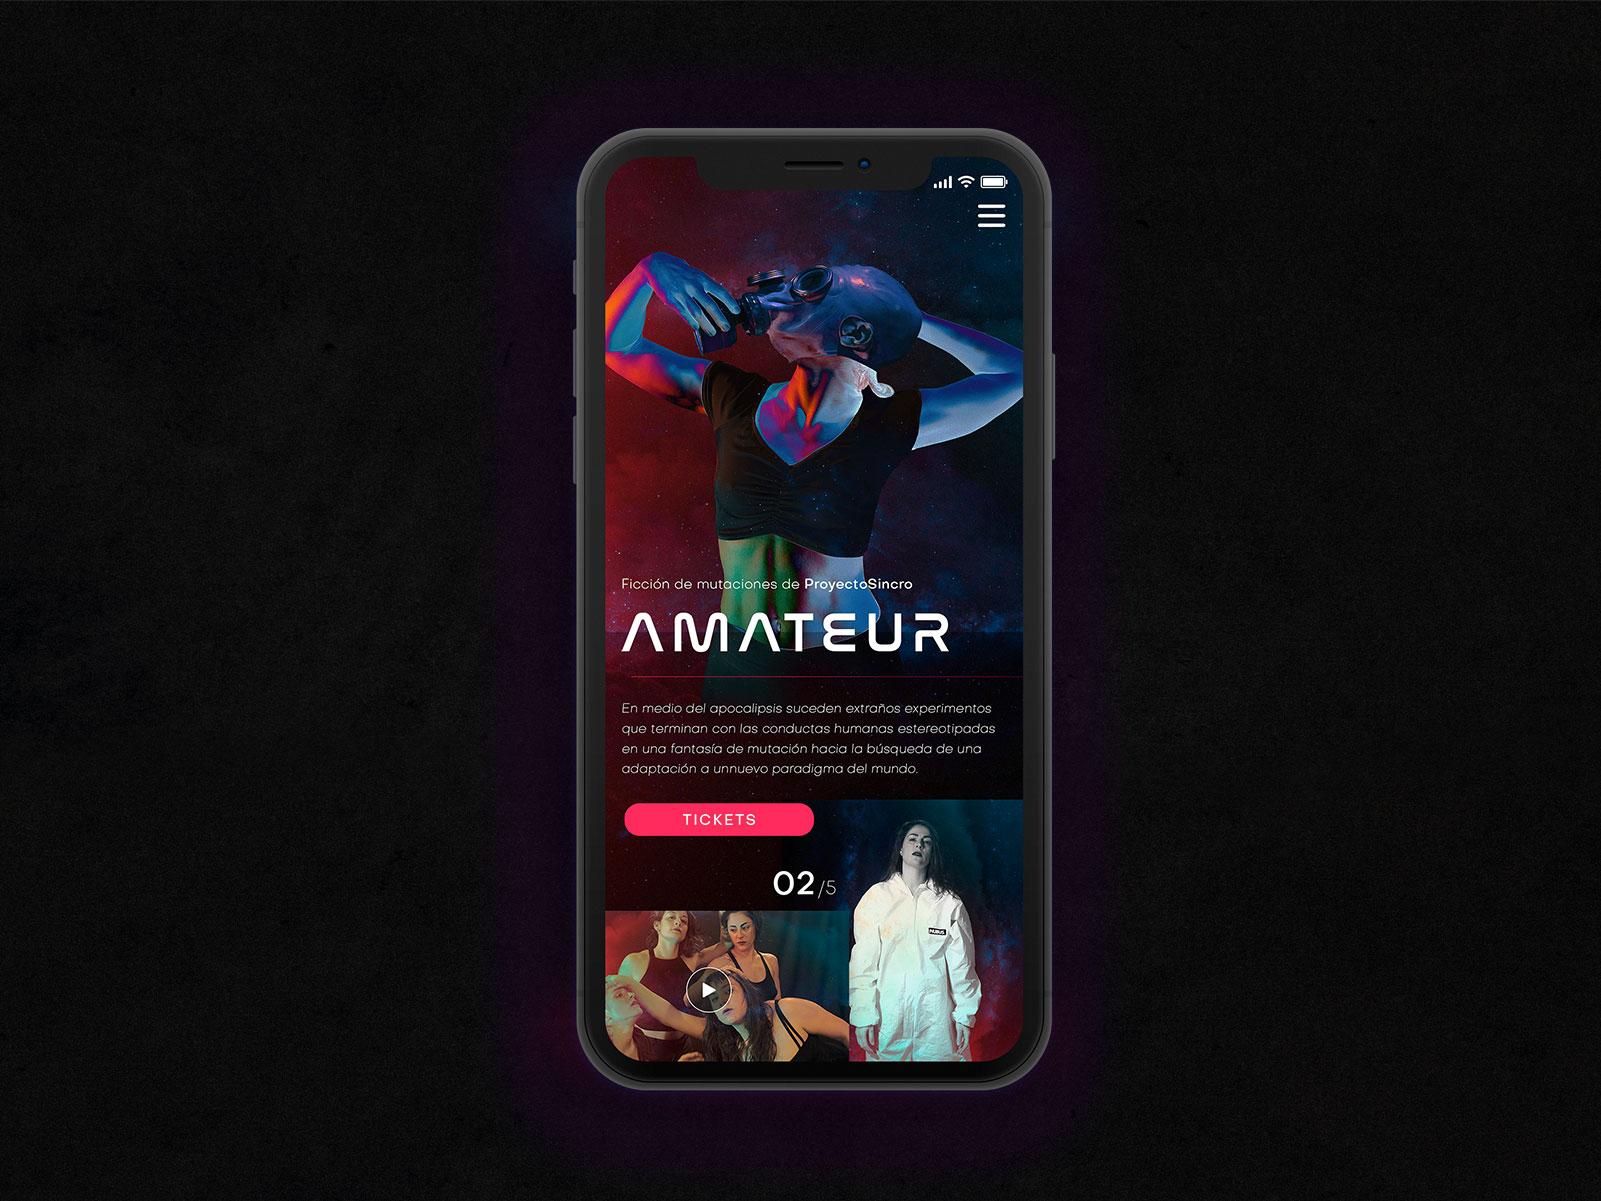 Amateur Hd Mobile By Pablo On Dribbble